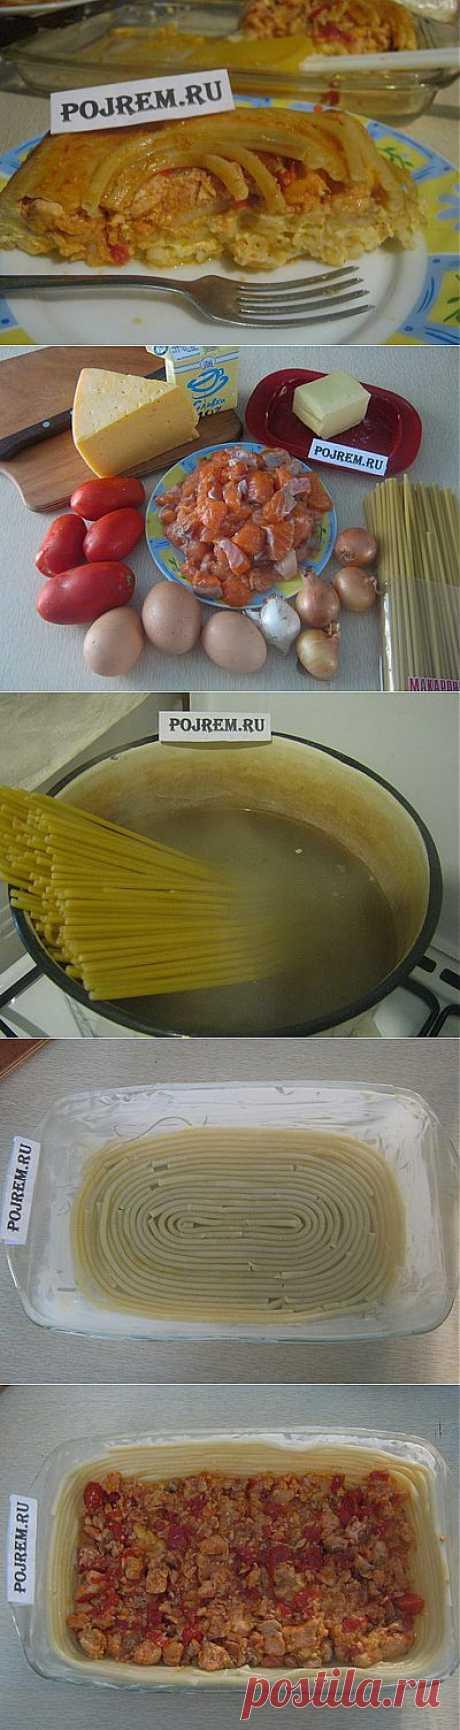 Рецепт запеканки из макарон. Макаронная запеканка - рецепт с